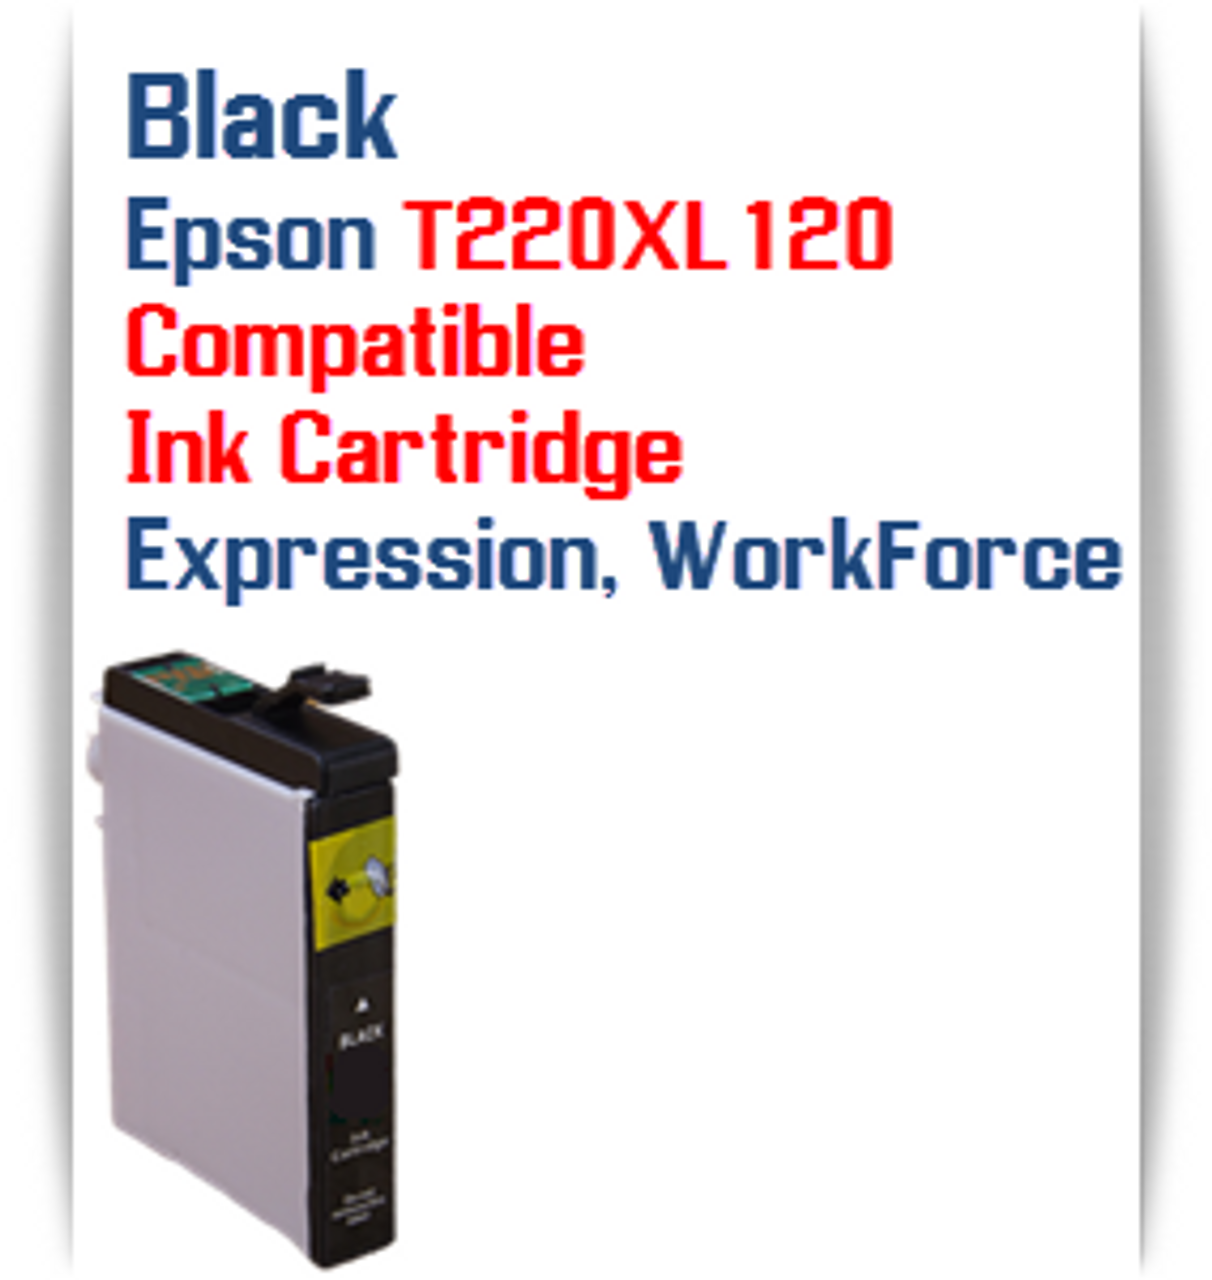 Black T220XL120 Epson Expression XP, WorkForce WF Compatible Printer Ink Cartridge  Epson Expression XP-320 Epson Expression XP-420 Epson Expression XP-424  Epson WorkForce WF-2630 Epson WorkForce WF-2650 Epson WorkForce WF-2660 Epson WorkForce WF-2750 Epson WorkForce WF-2760